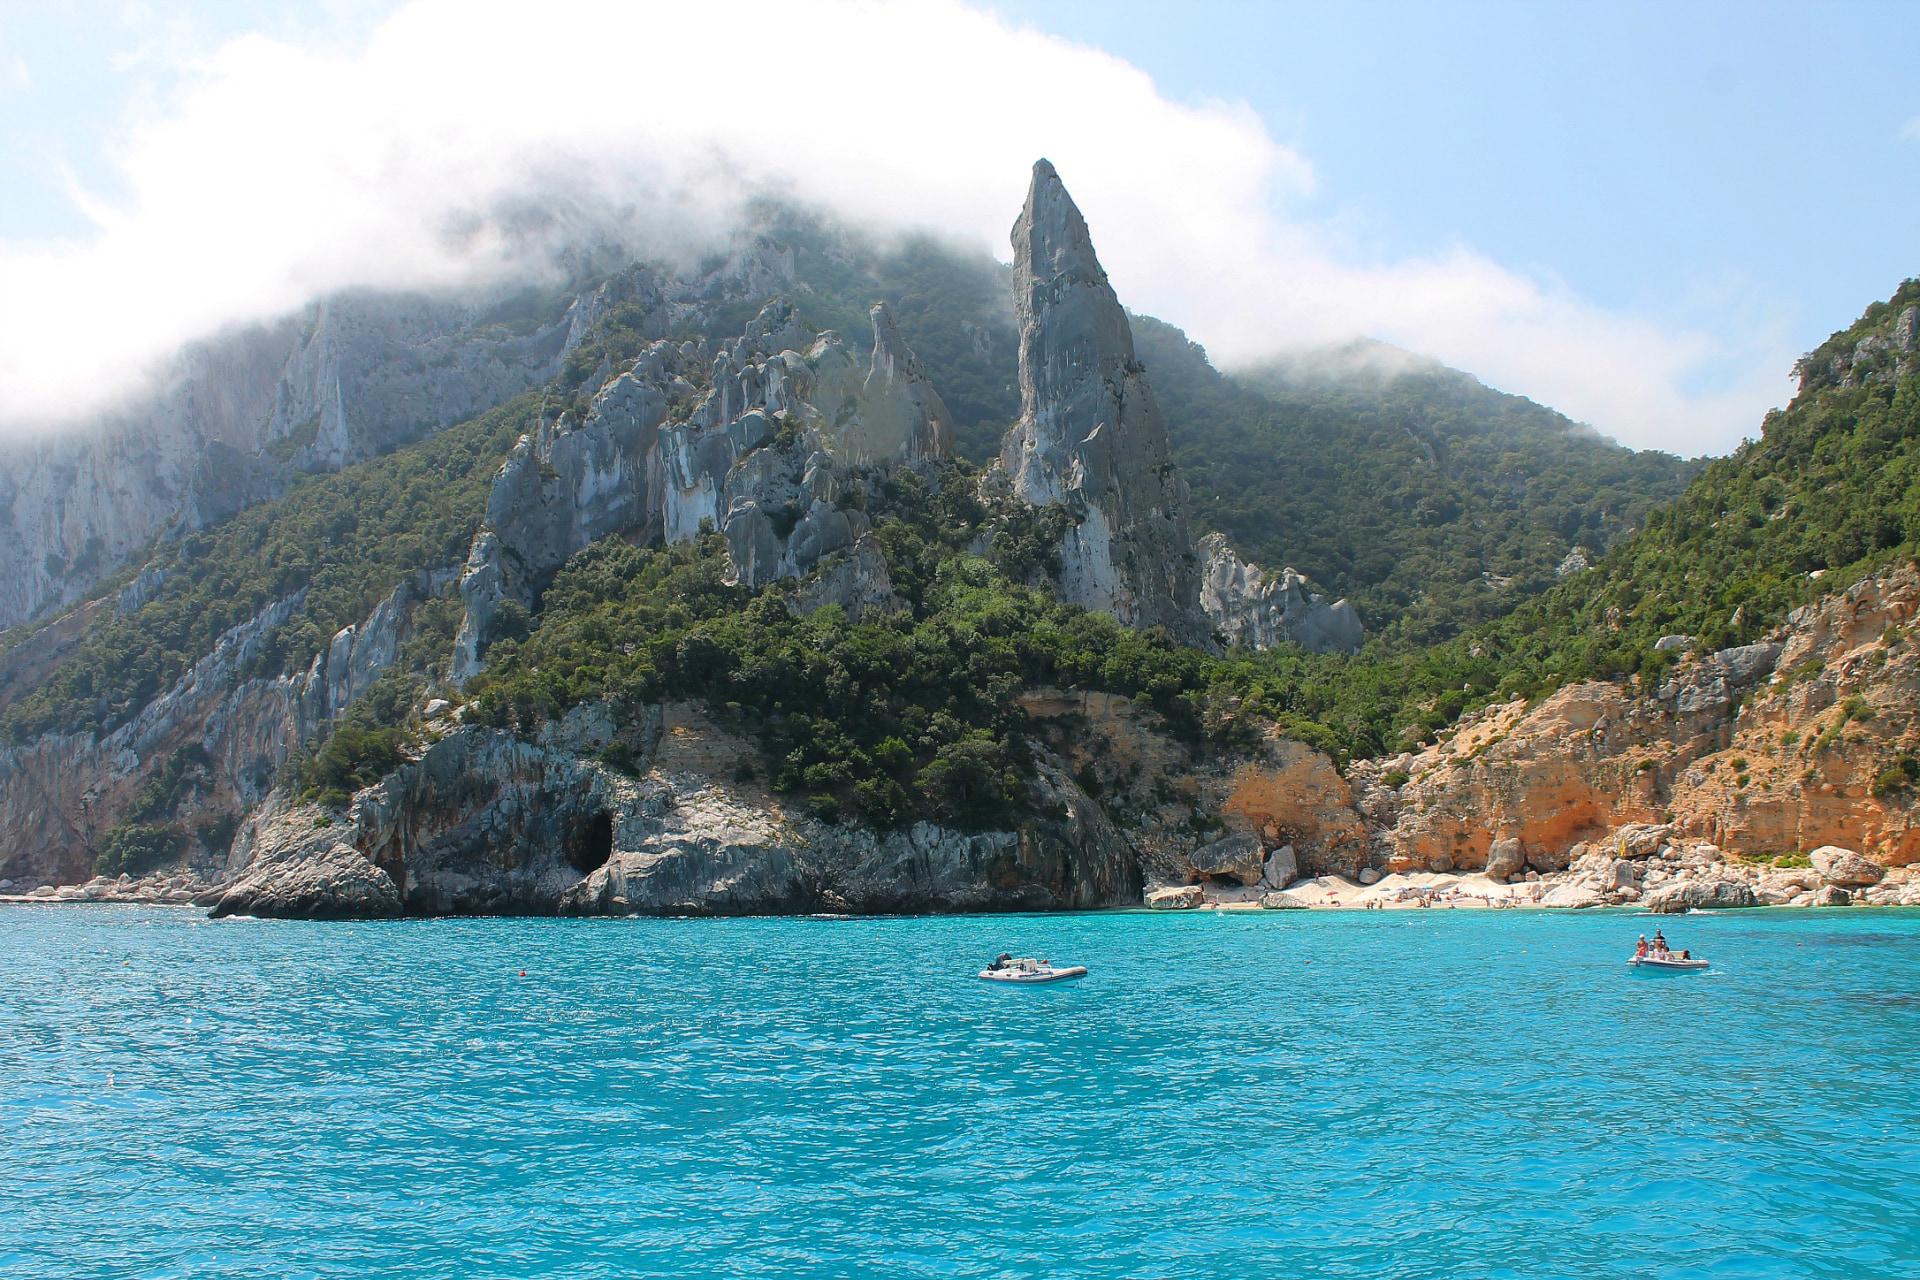 Cala Goloritzé, Ogliastra, Sardegna